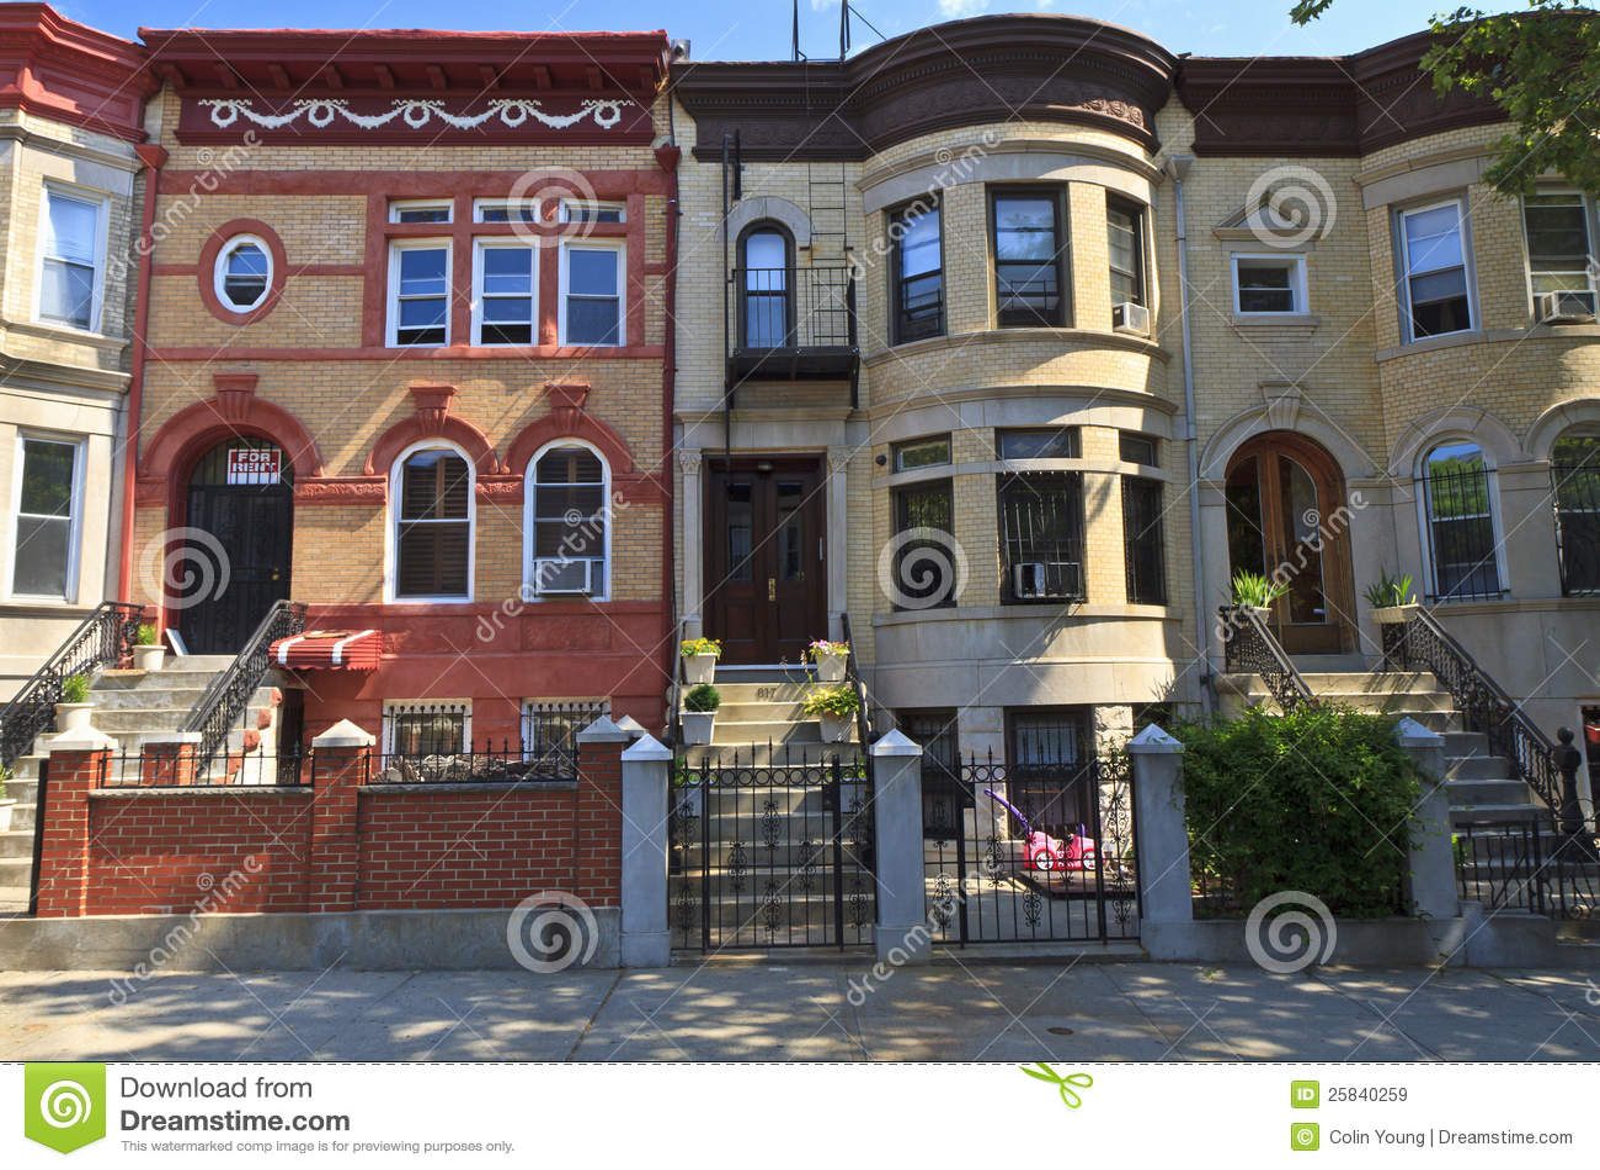 Brooklyn brick apartments royalty free stock images for Buy apartment brooklyn ny